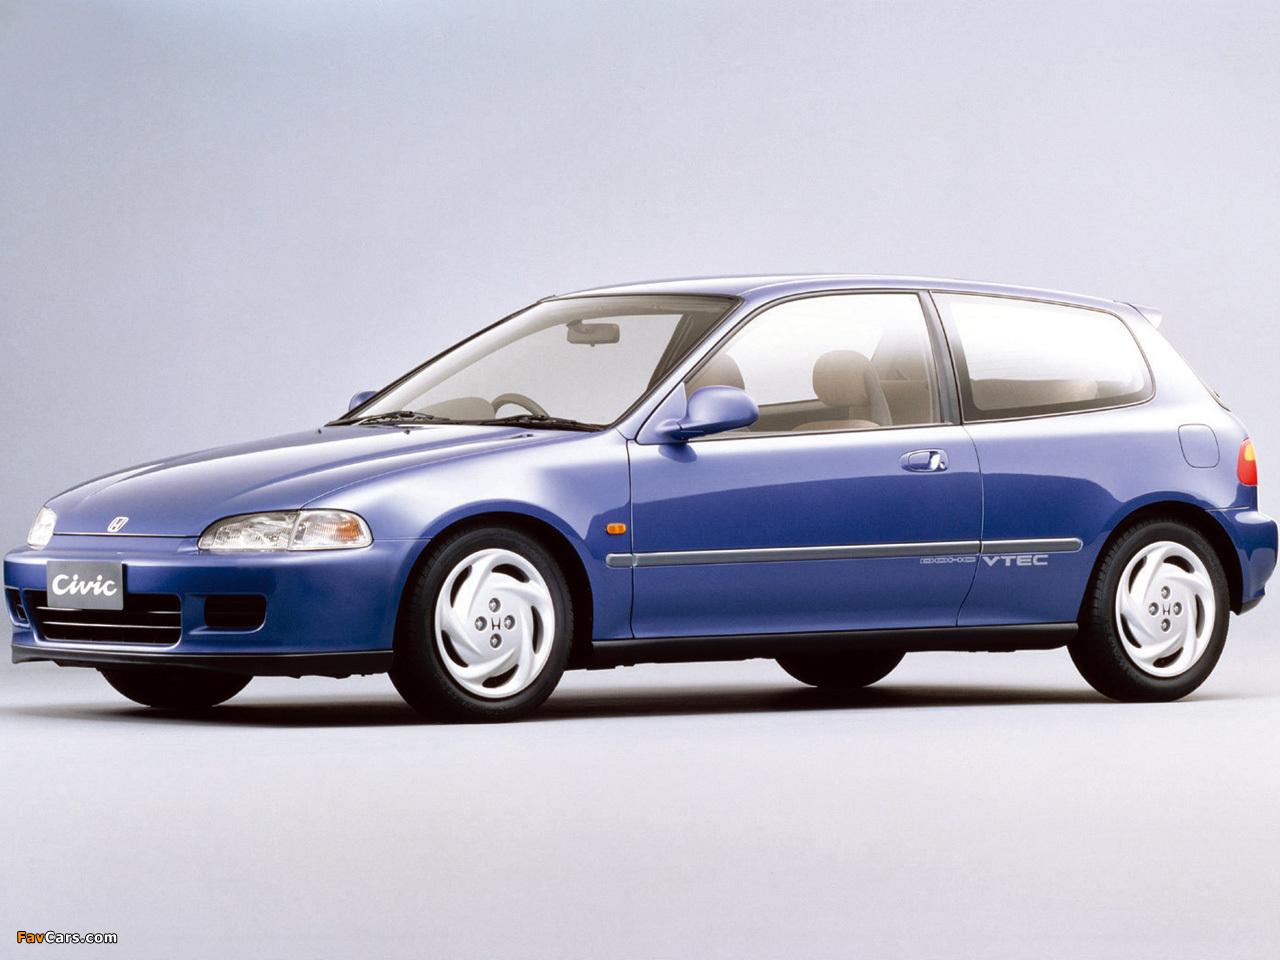 Honda civic eg6 rally car car interior design